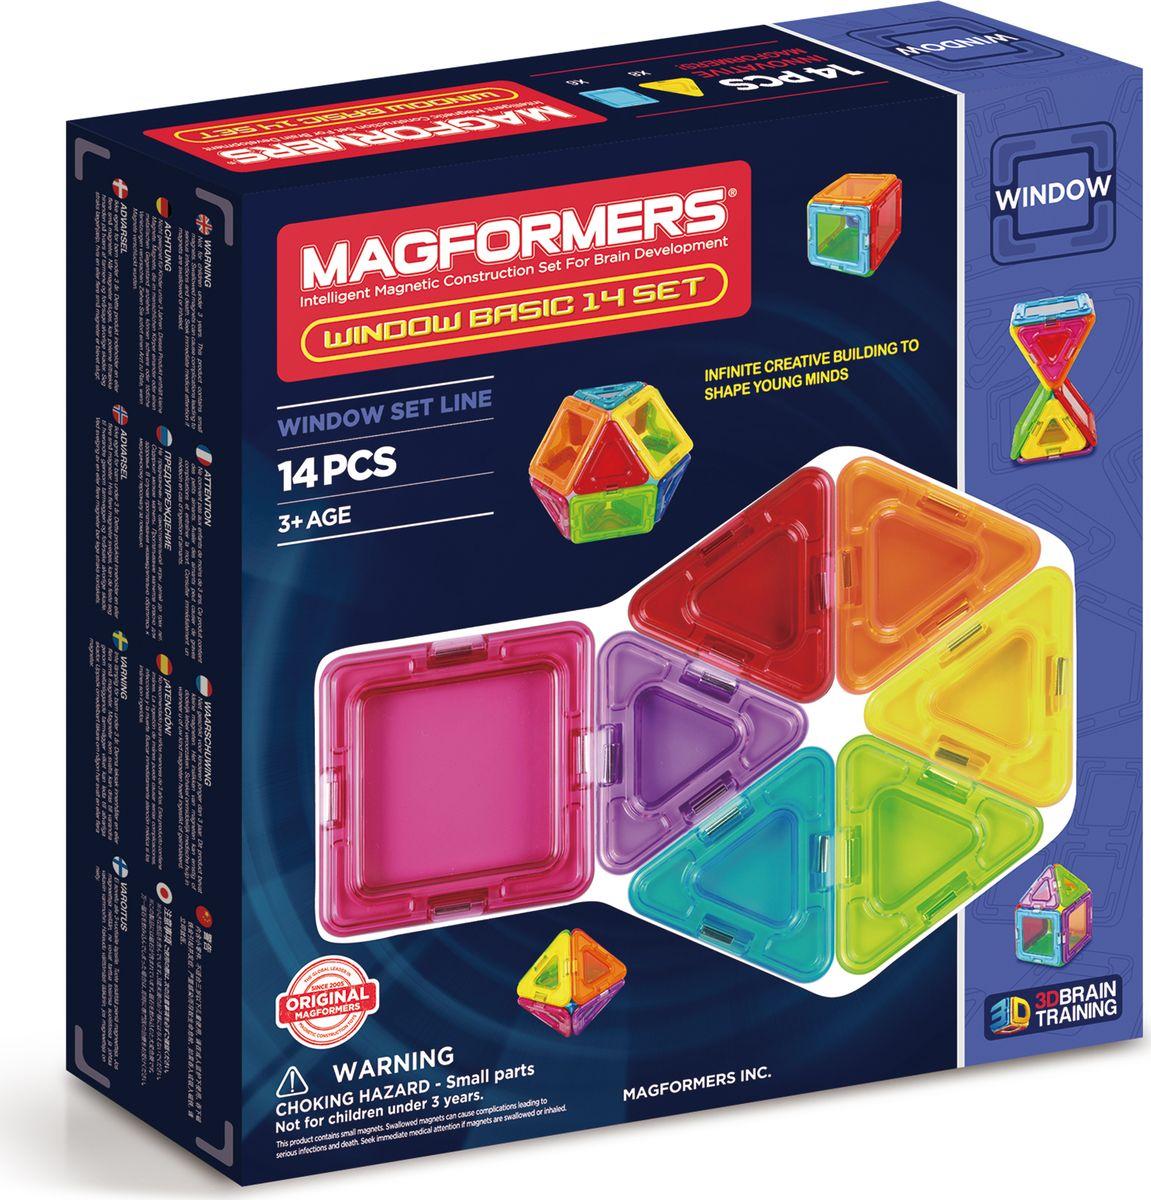 Magformers Магнитный конструктор Window Basic 14 Set